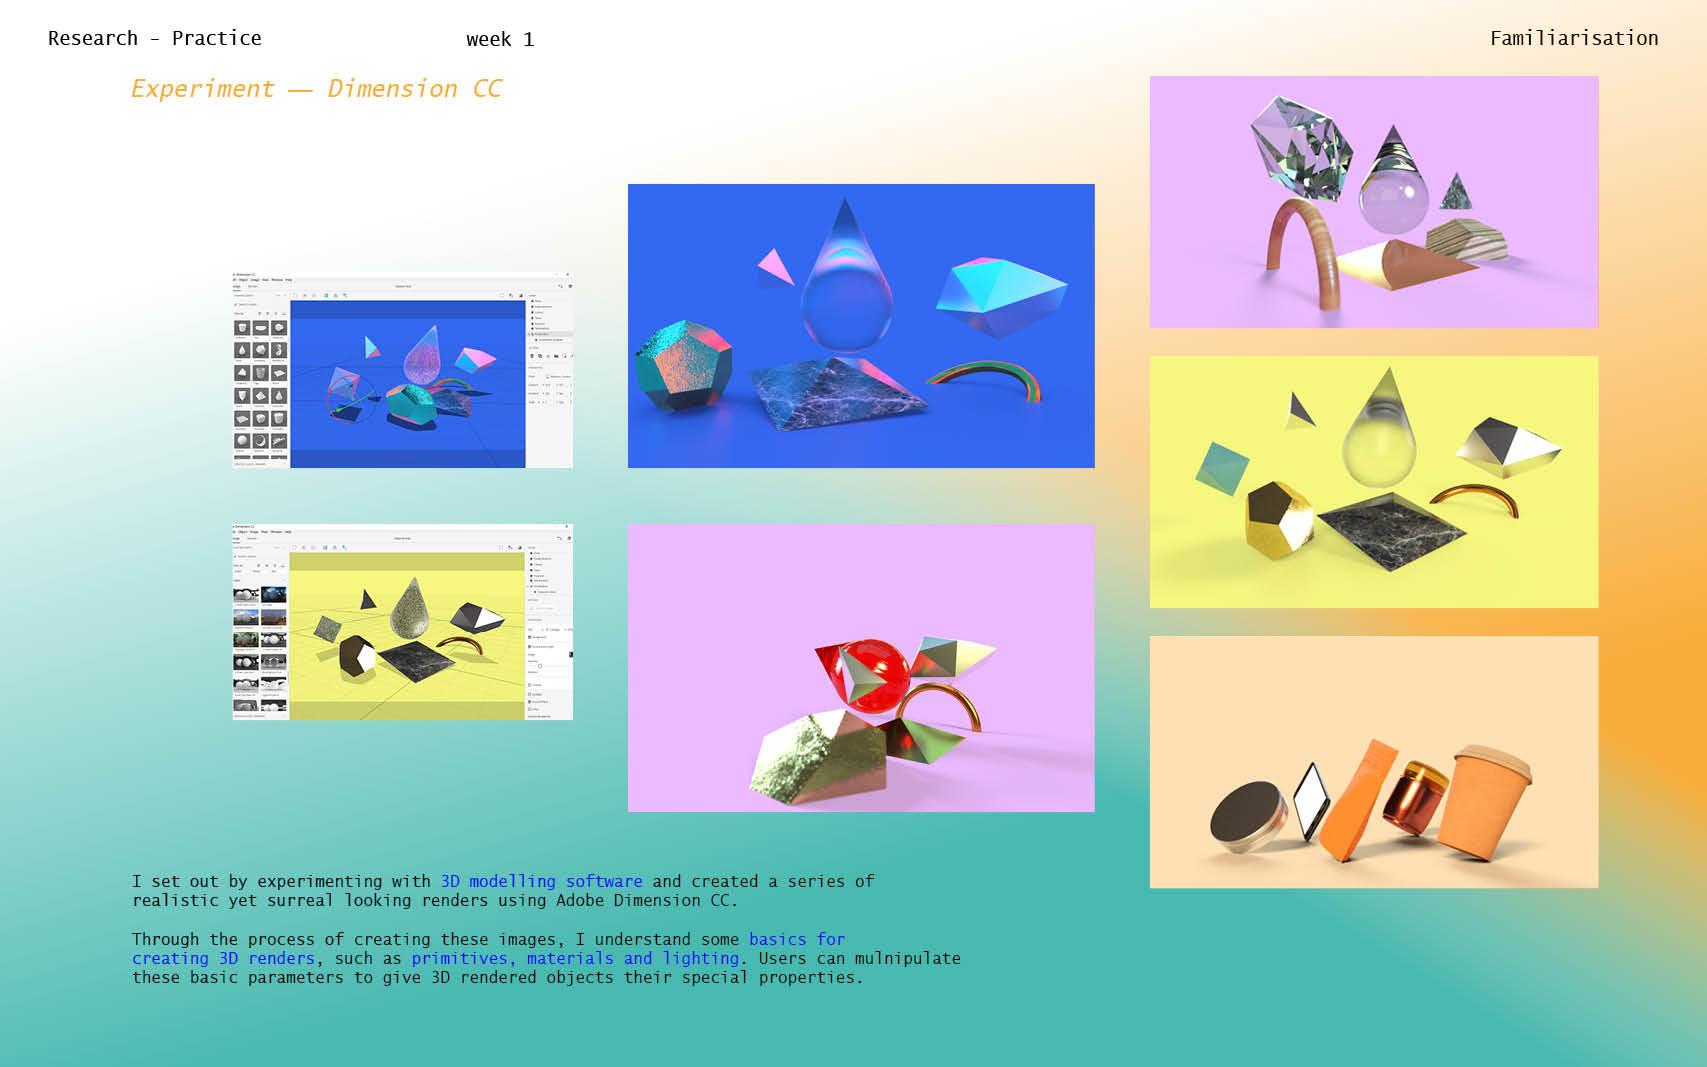 R-P process book 2019_03 small size4.jpg